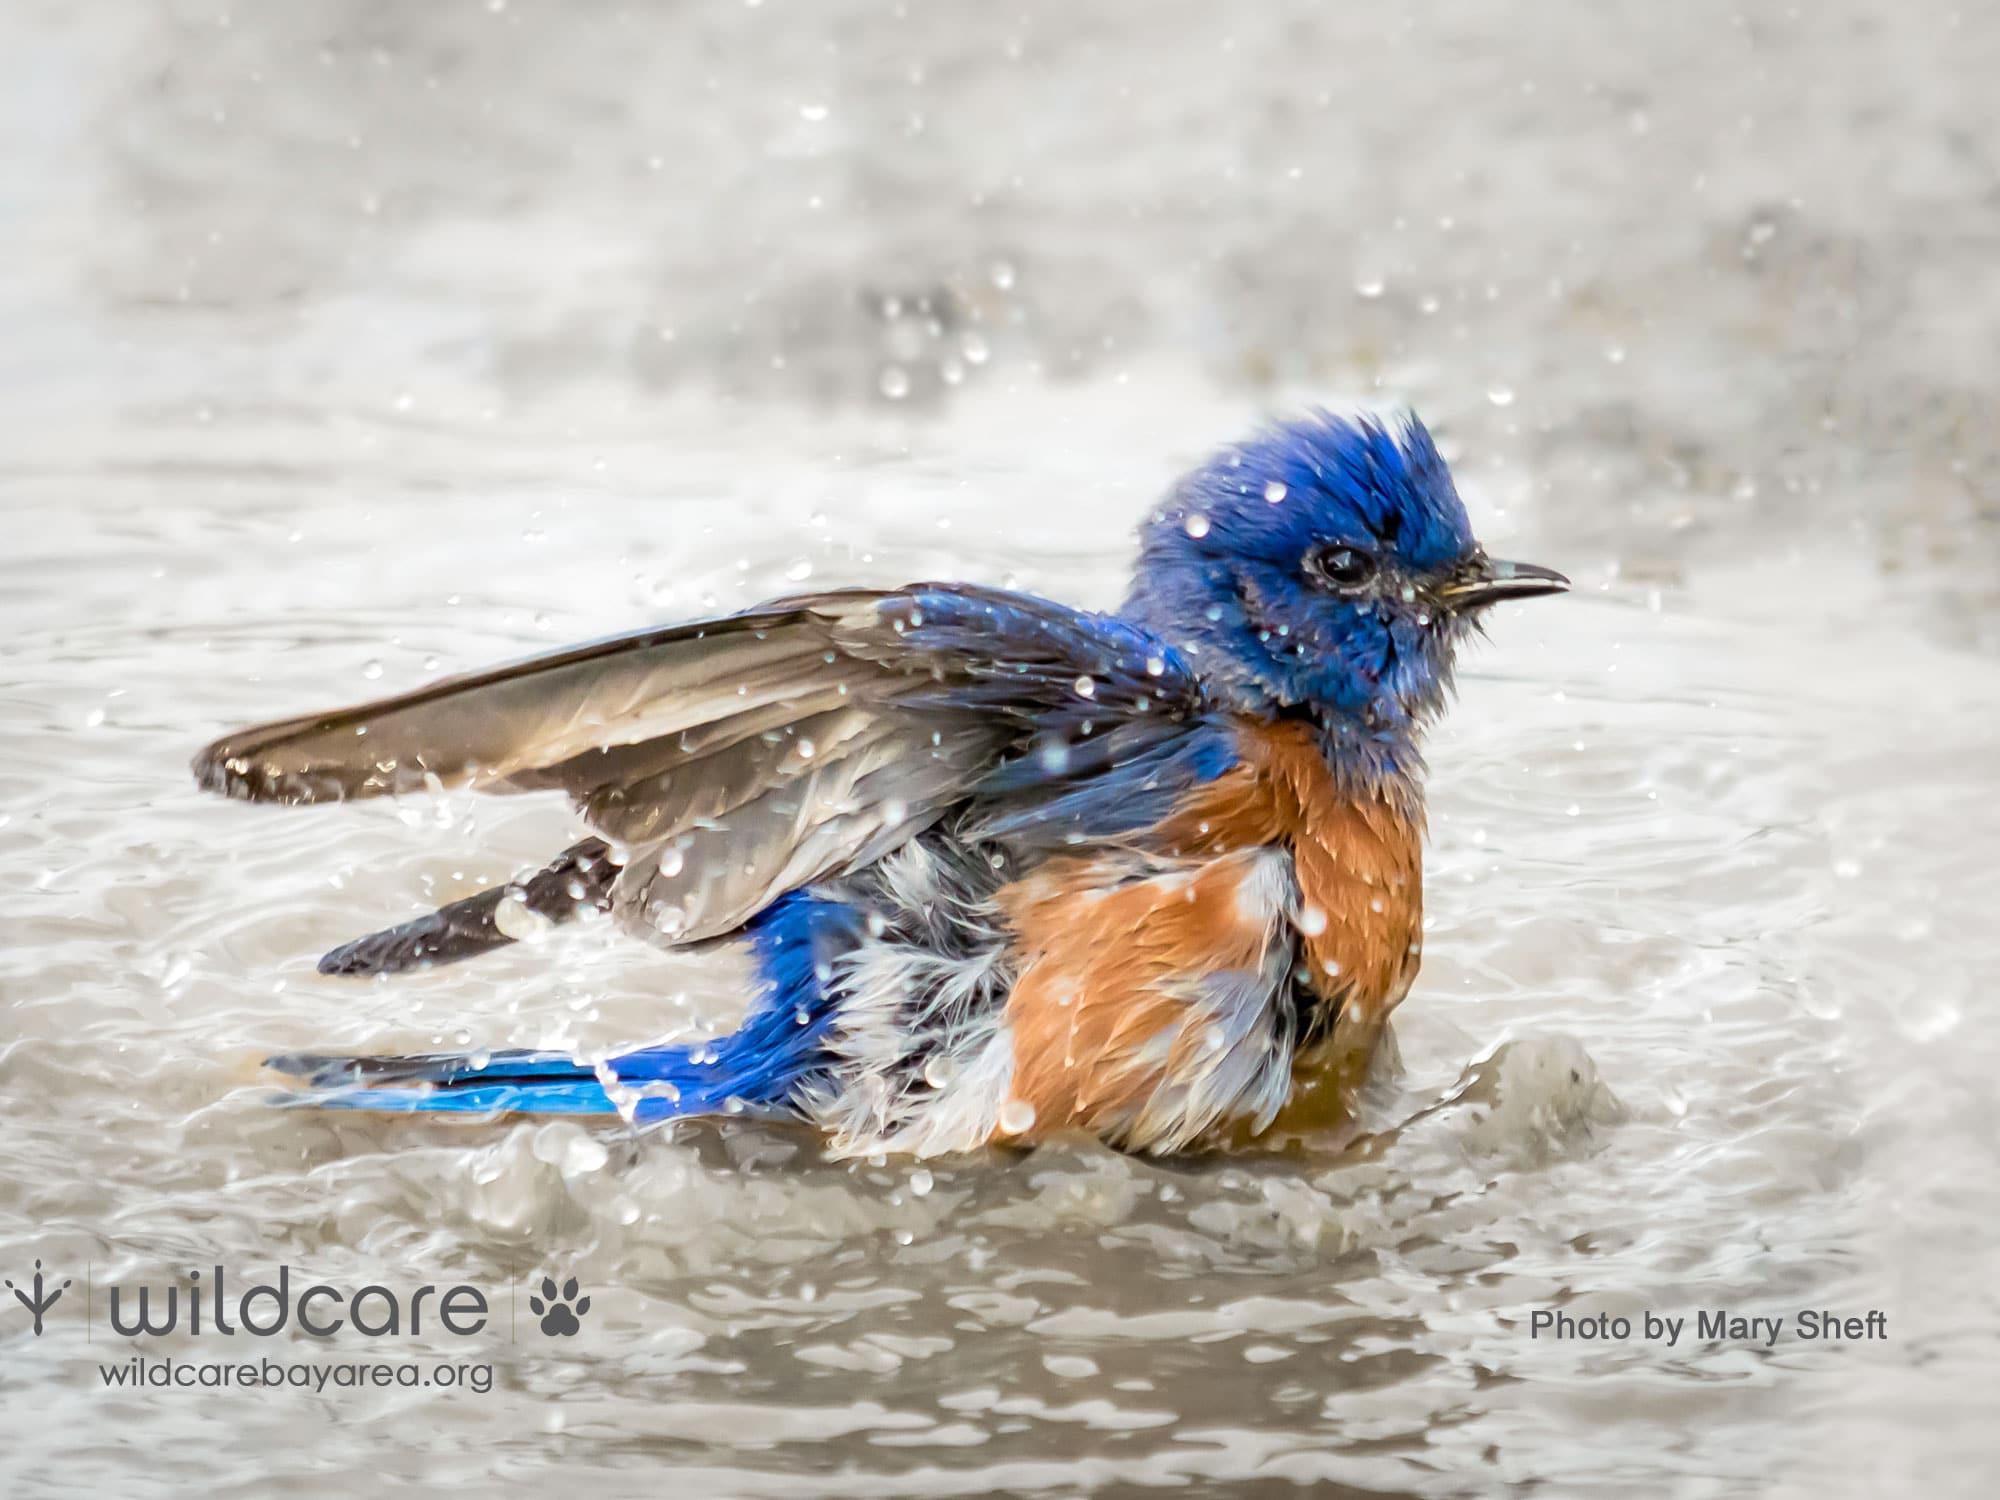 Bathing Bluebird. Photo by Mary Sheft